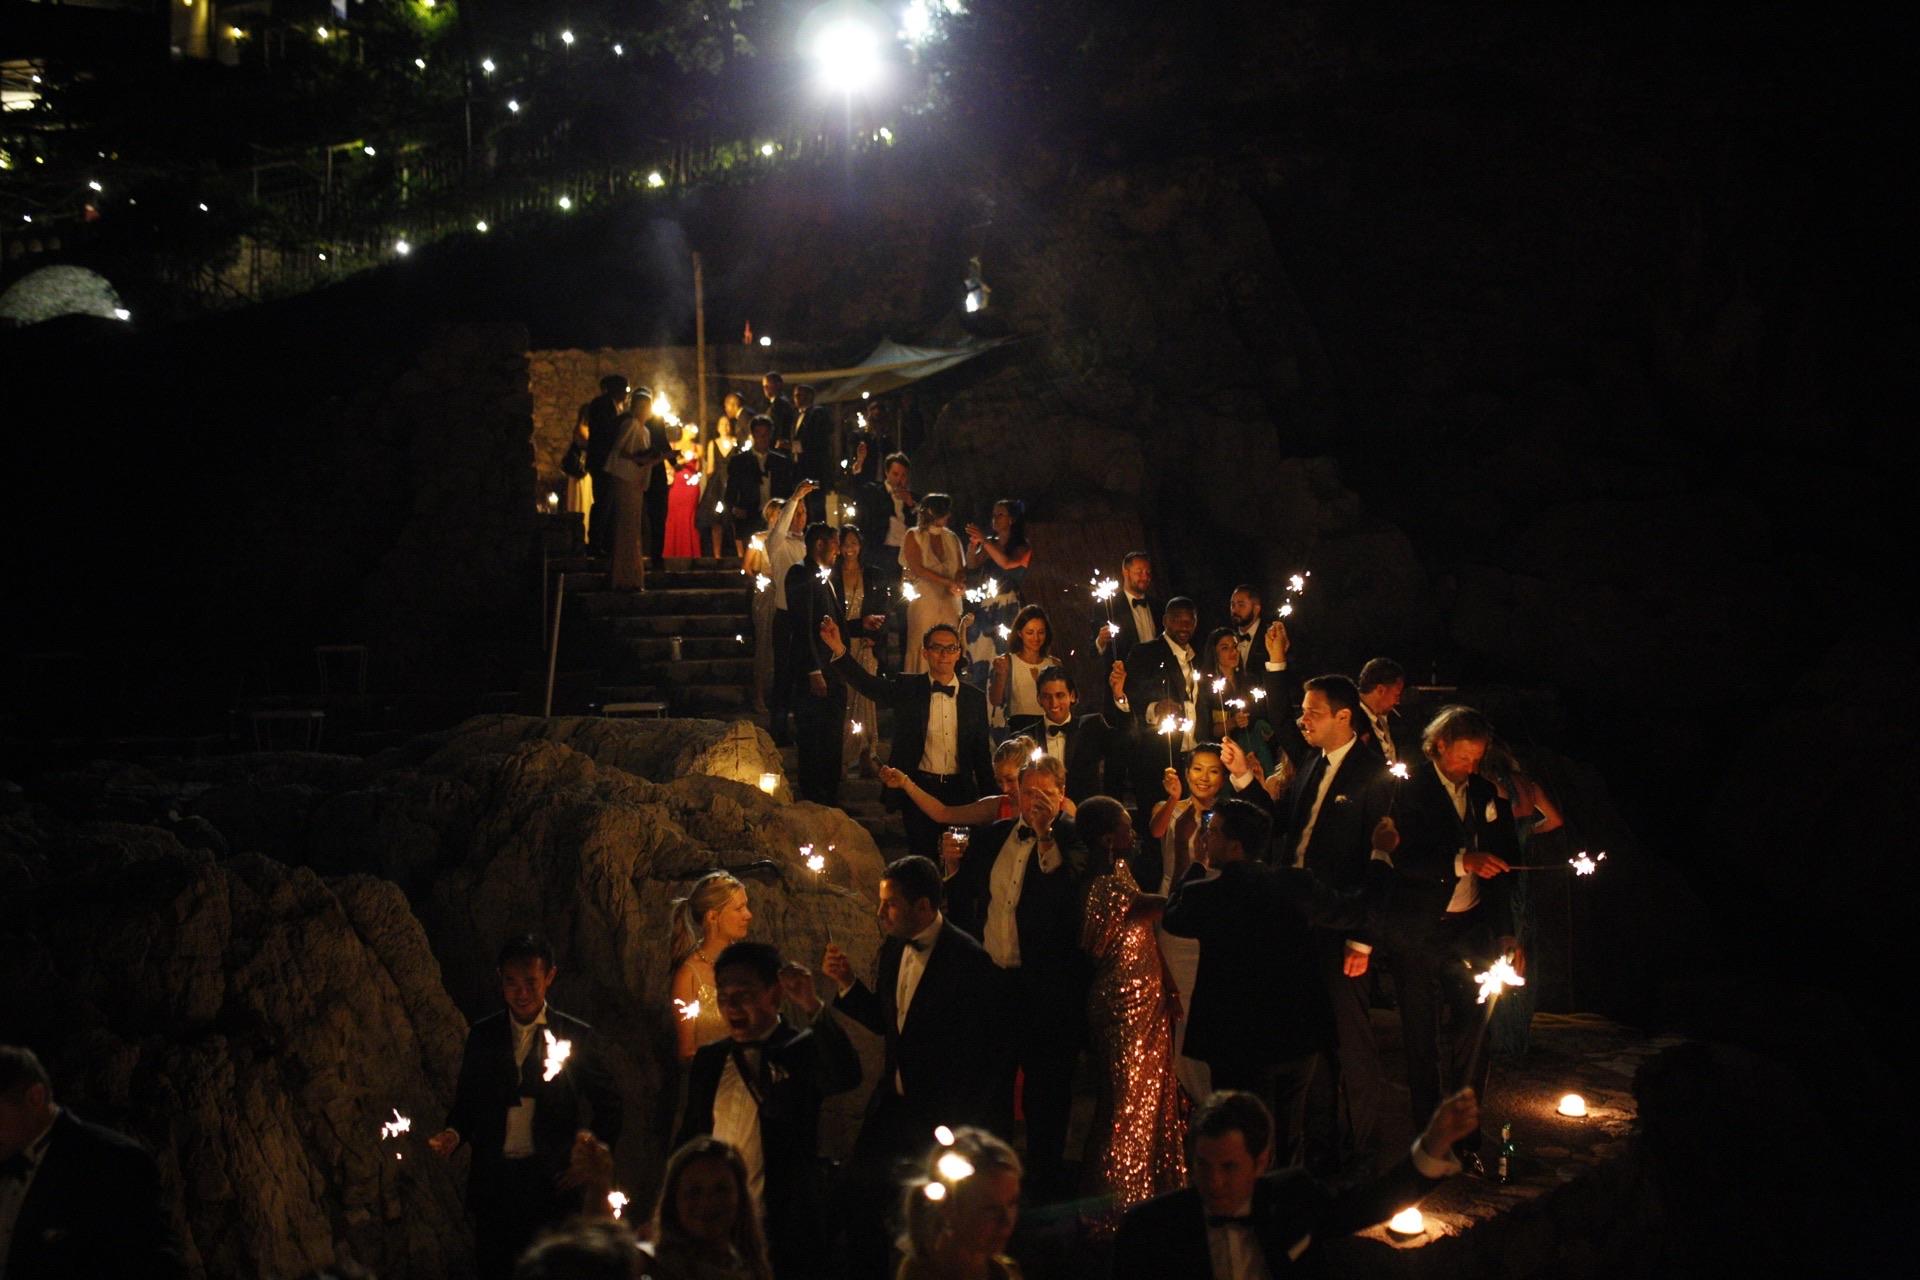 https://www.weddingamalfi.com/wp-content/uploads/Nathalie-and-Benjamin-Wedding-in-Positano-Italy-22.jpg